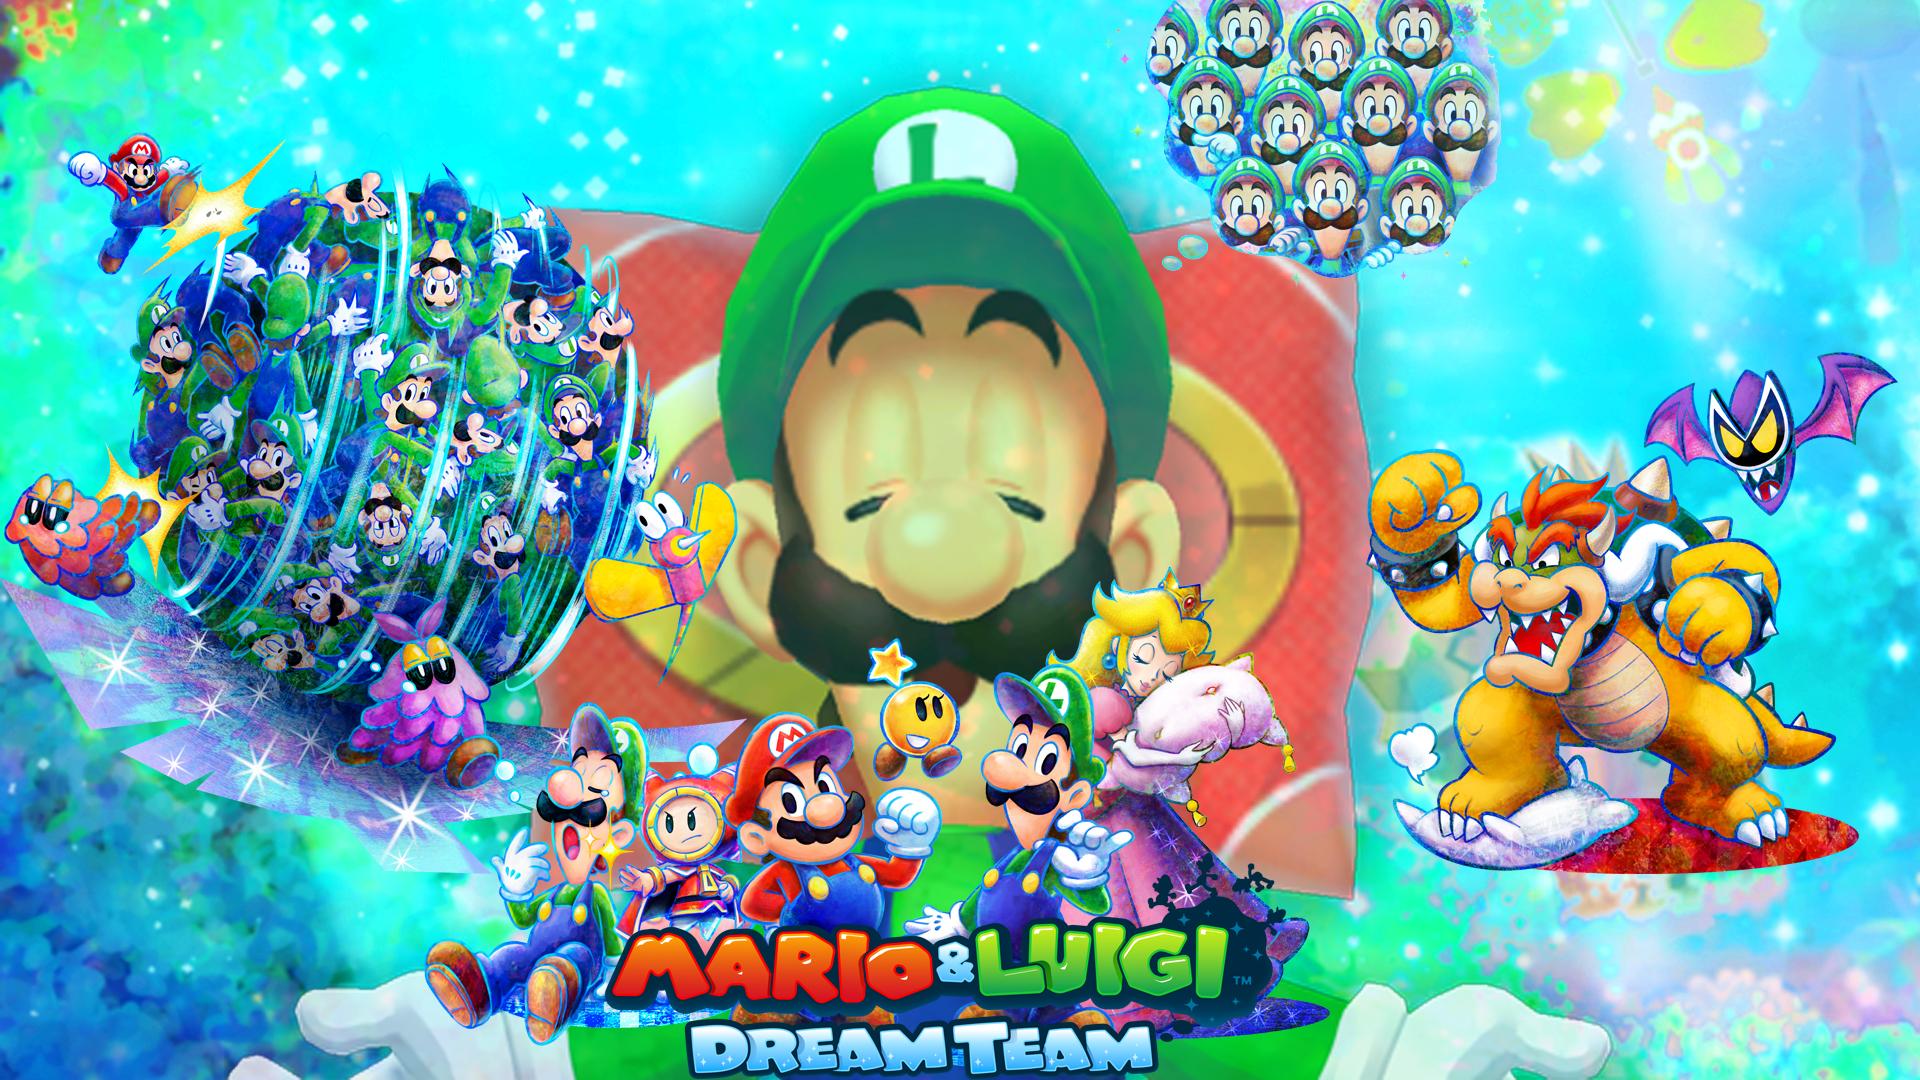 Mario And Luigi Dream Team Wallpaper By Zupertompa On Deviantart